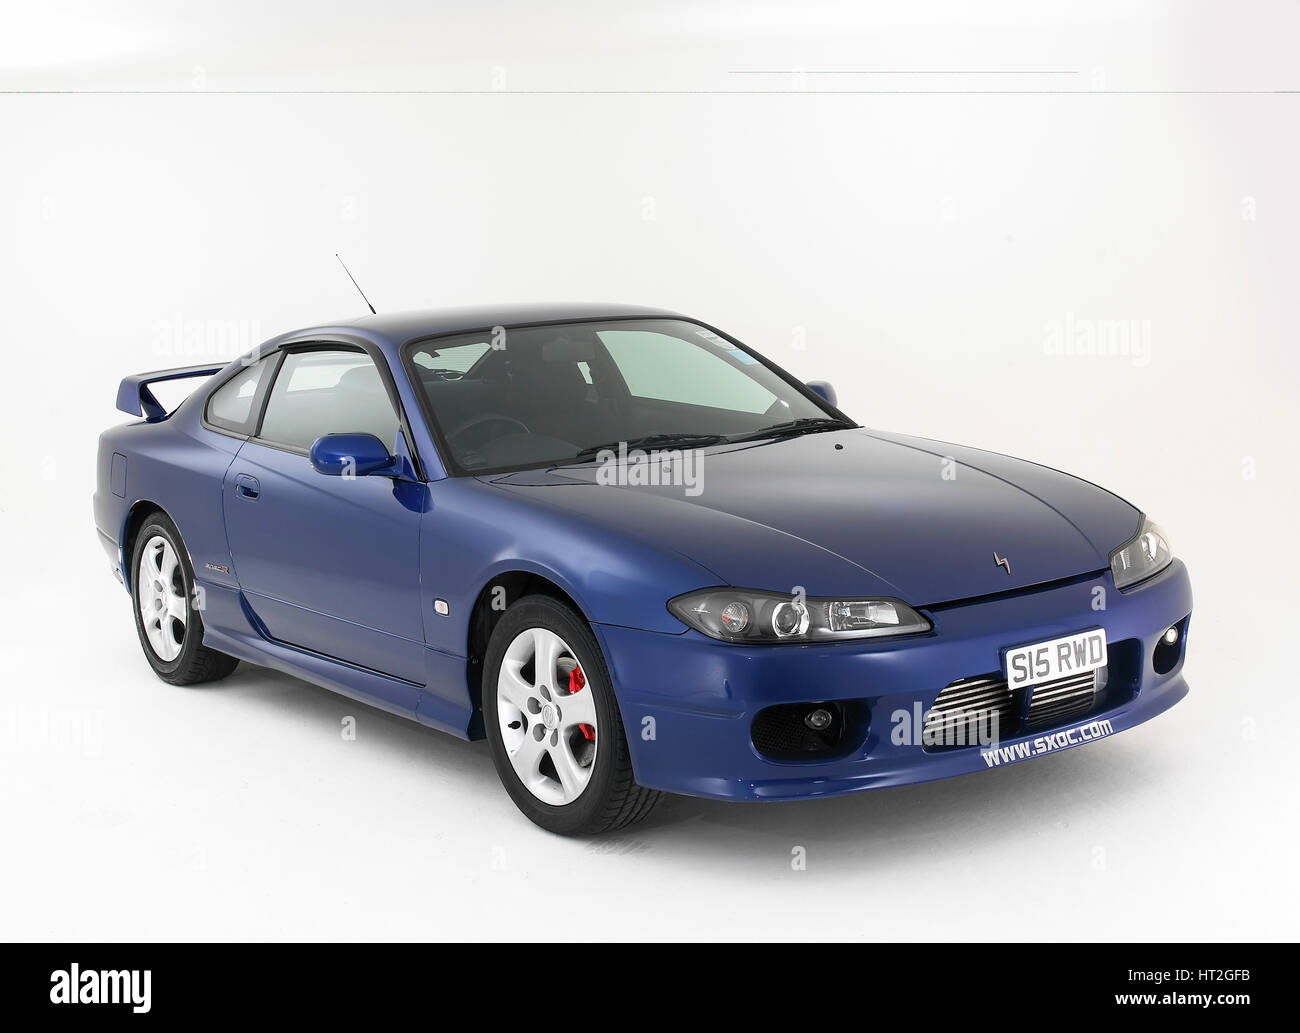 Perfect 1999 Nissan Silvia Spec R Artist: Unknown.   Stock Image